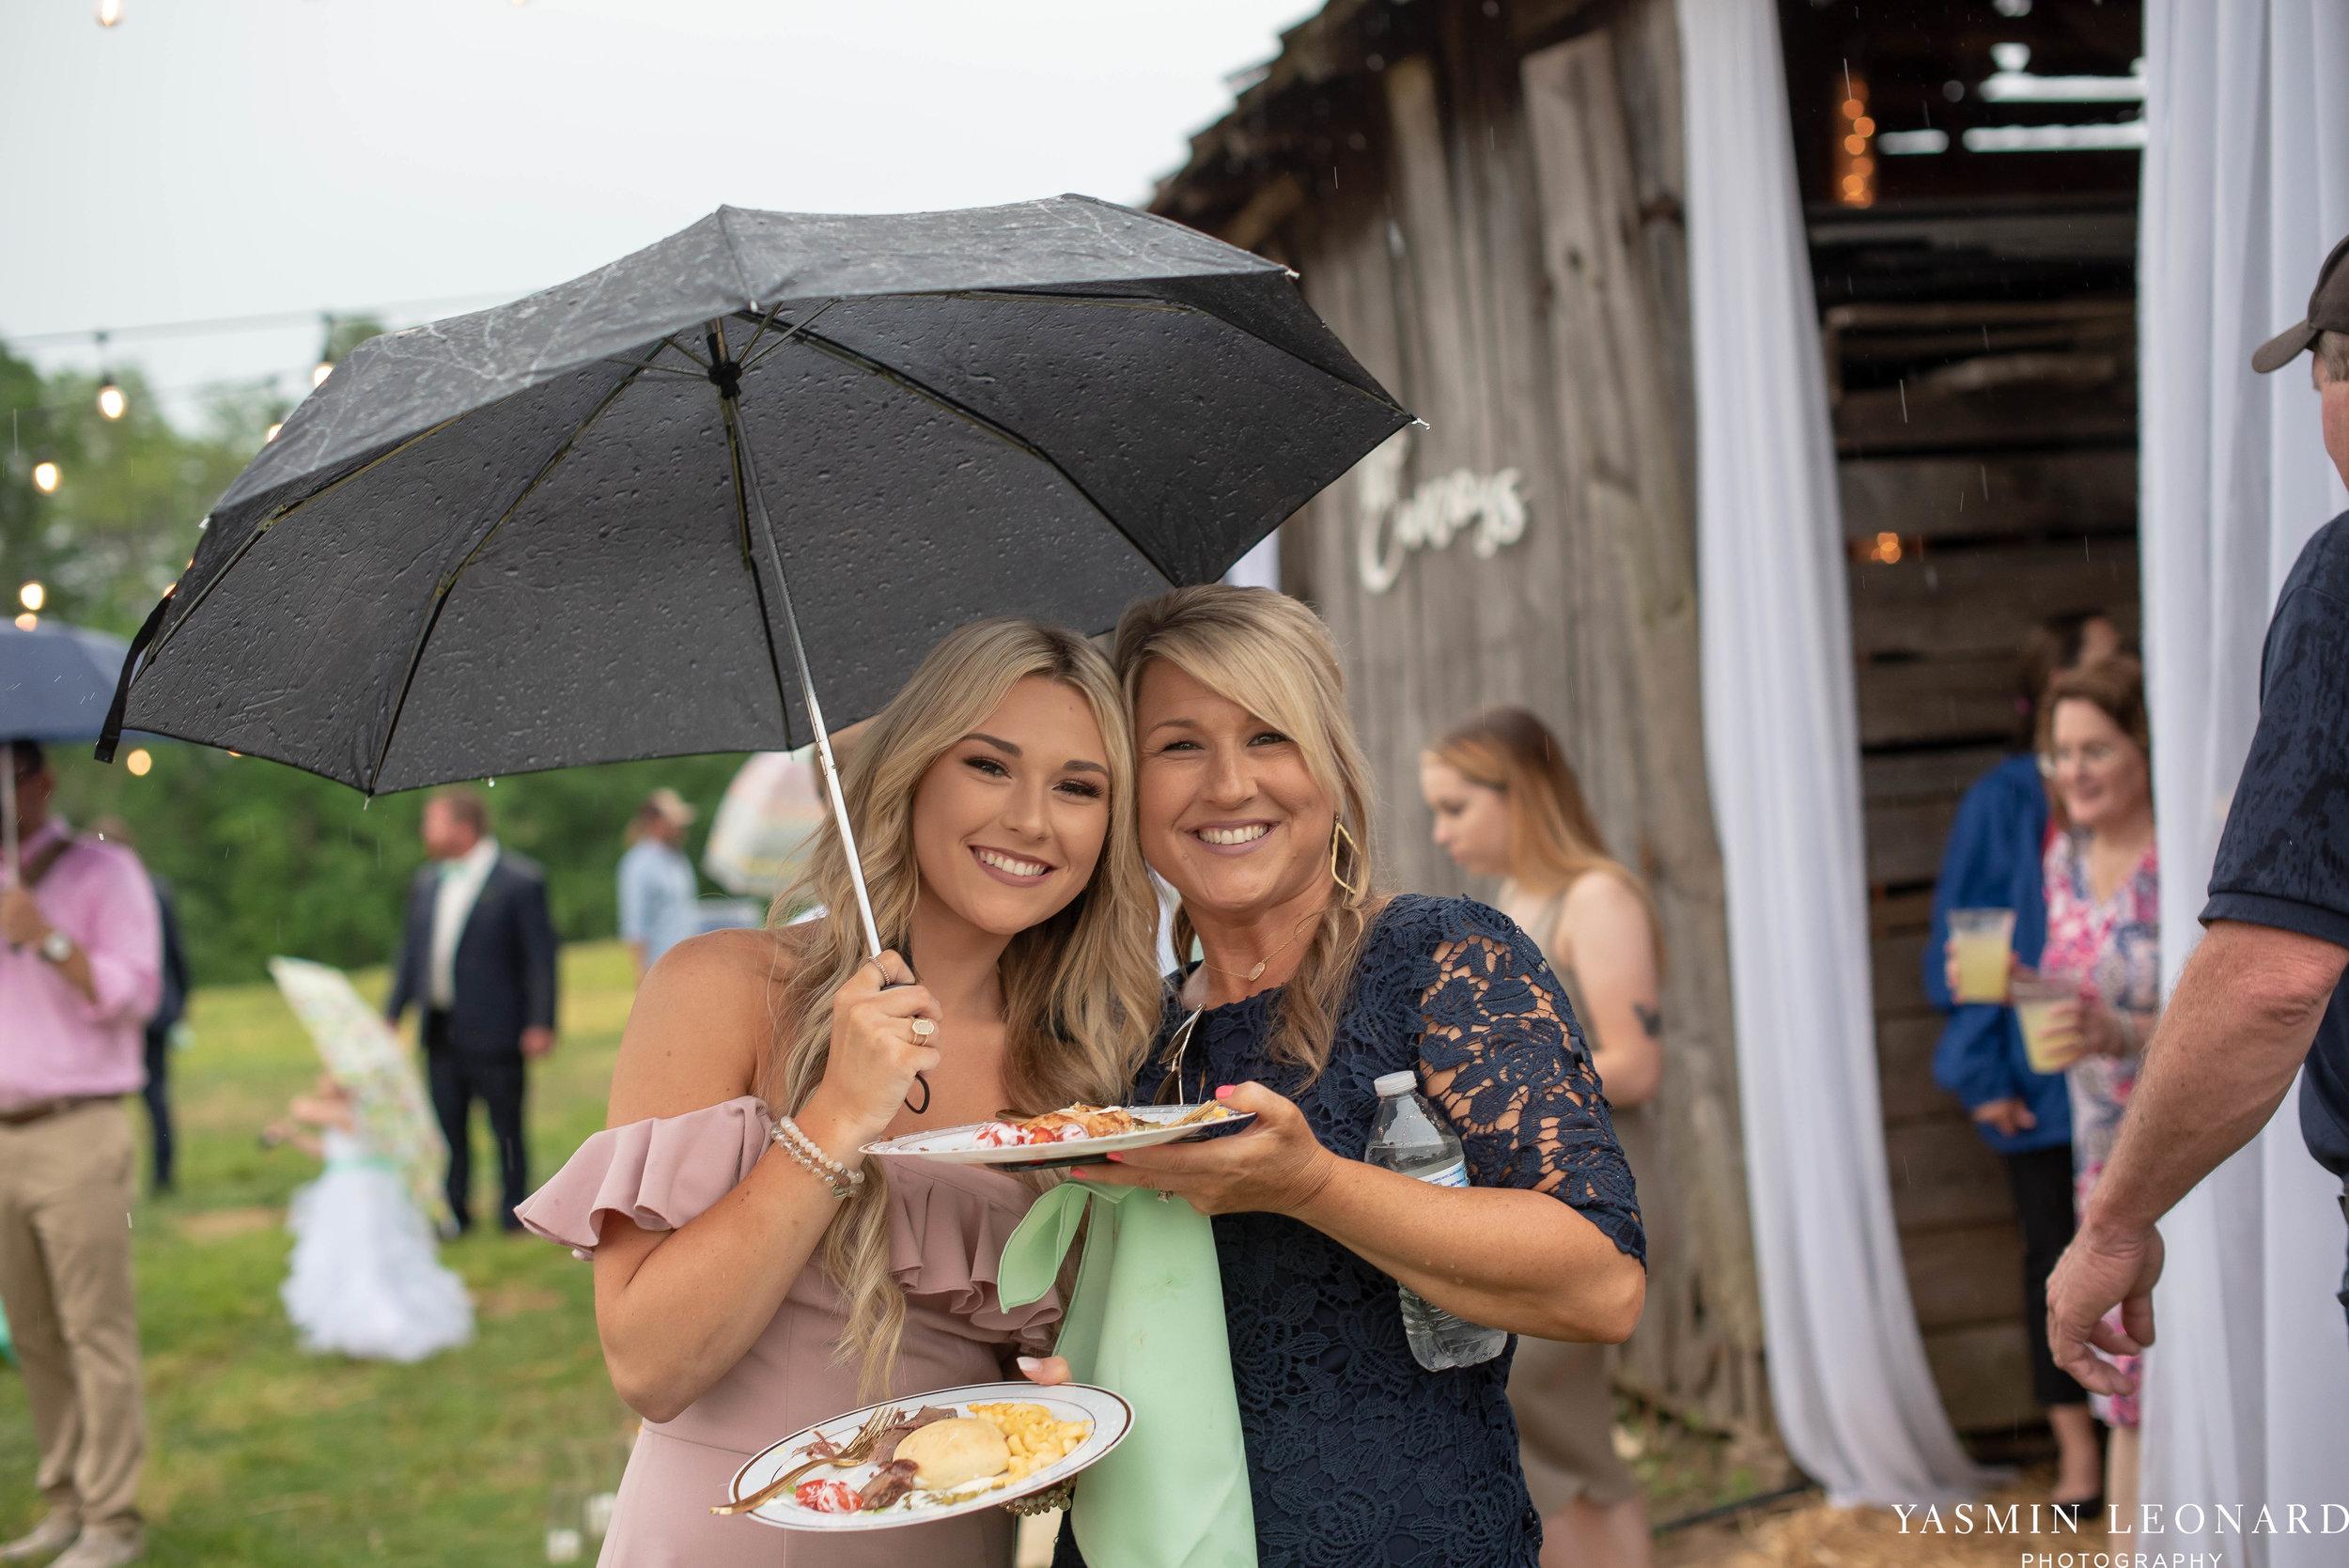 Rain on your wedding day - Rainy Wedding - Plan B for Rain - What to do if it rains on your wedding day - Wedding Inspiration - Outdoor wedding ideas - Rainy Wedding Pictures - Yasmin Leonard Photography-57.jpg